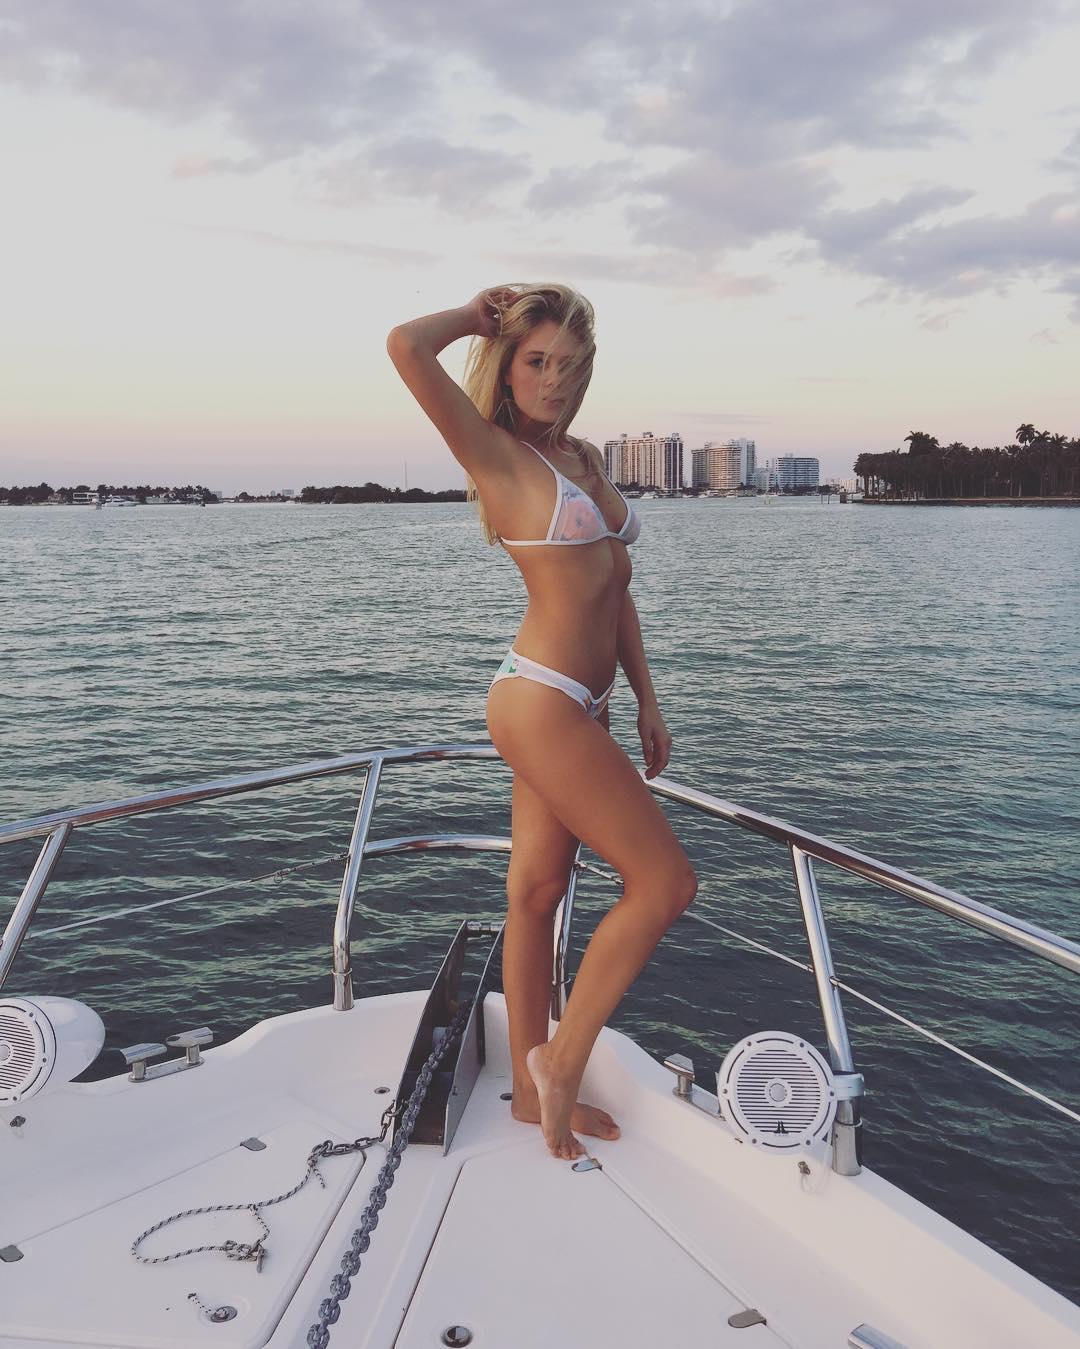 Bikini Madison Nagle naked (47 photos), Tits, Paparazzi, Boobs, butt 2019